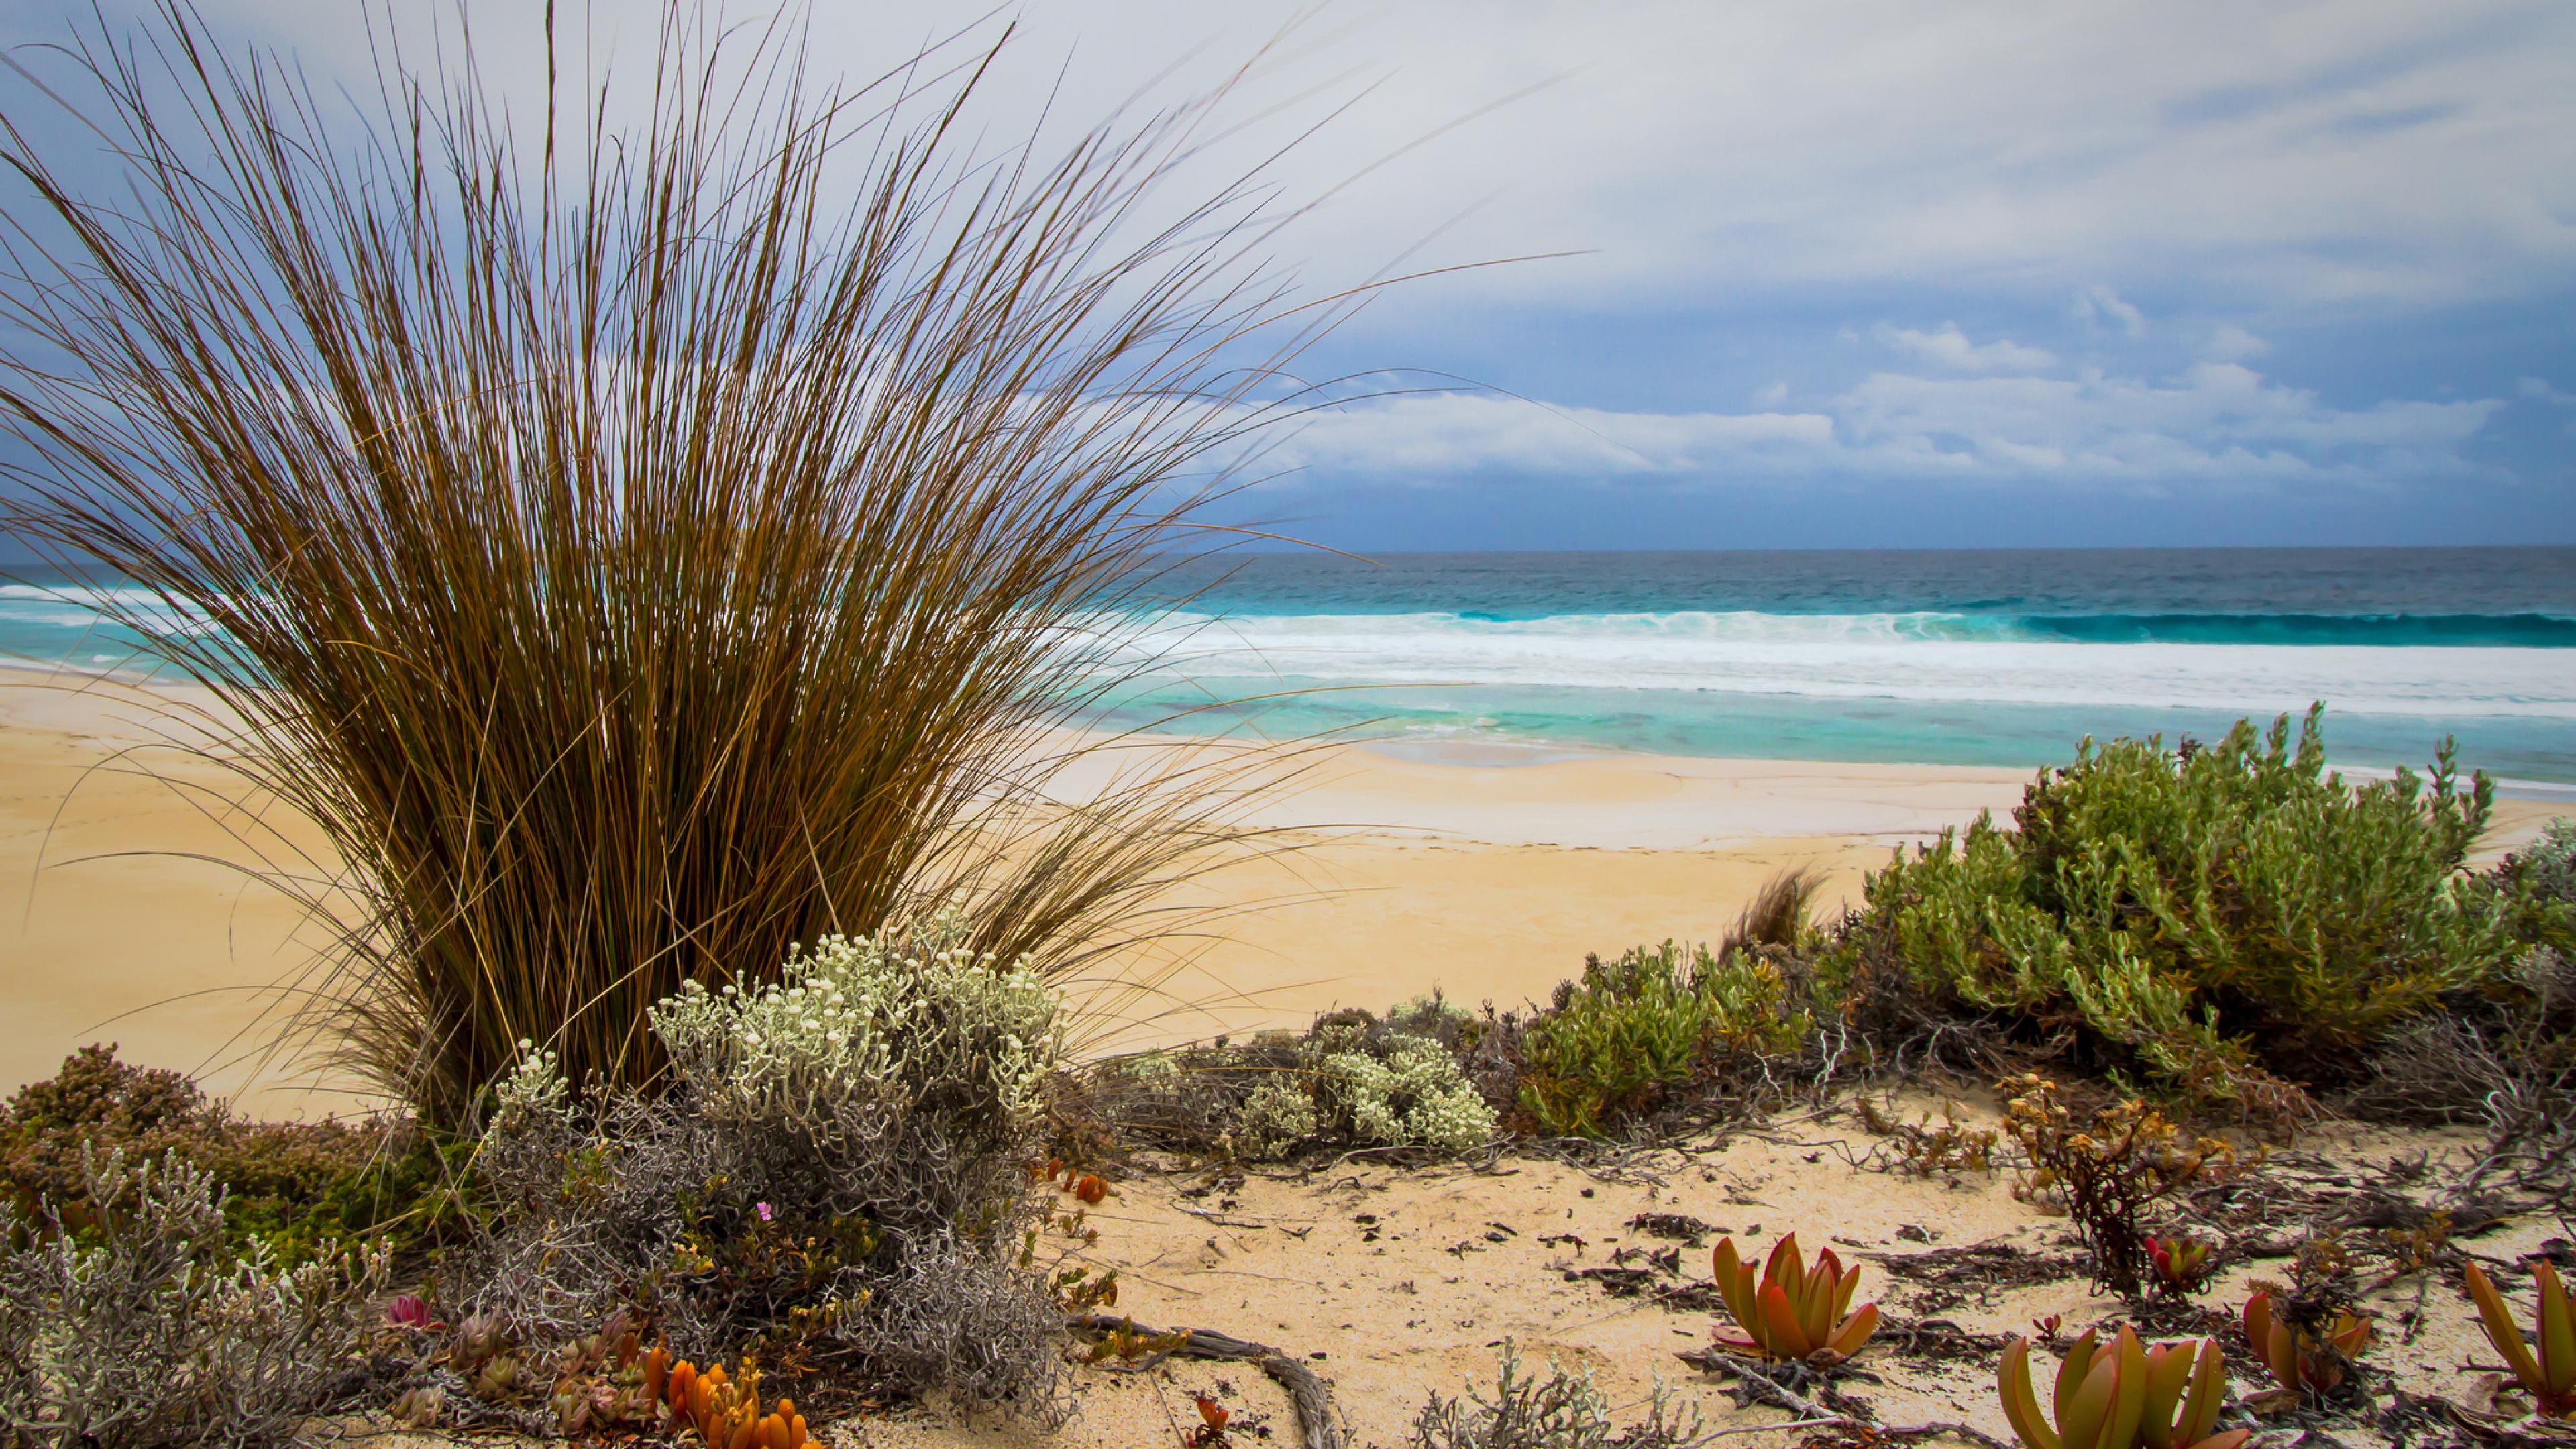 3840x2160 Sea Sand Beach 4k Wallpaper Hd Nature 4k Wallpapers